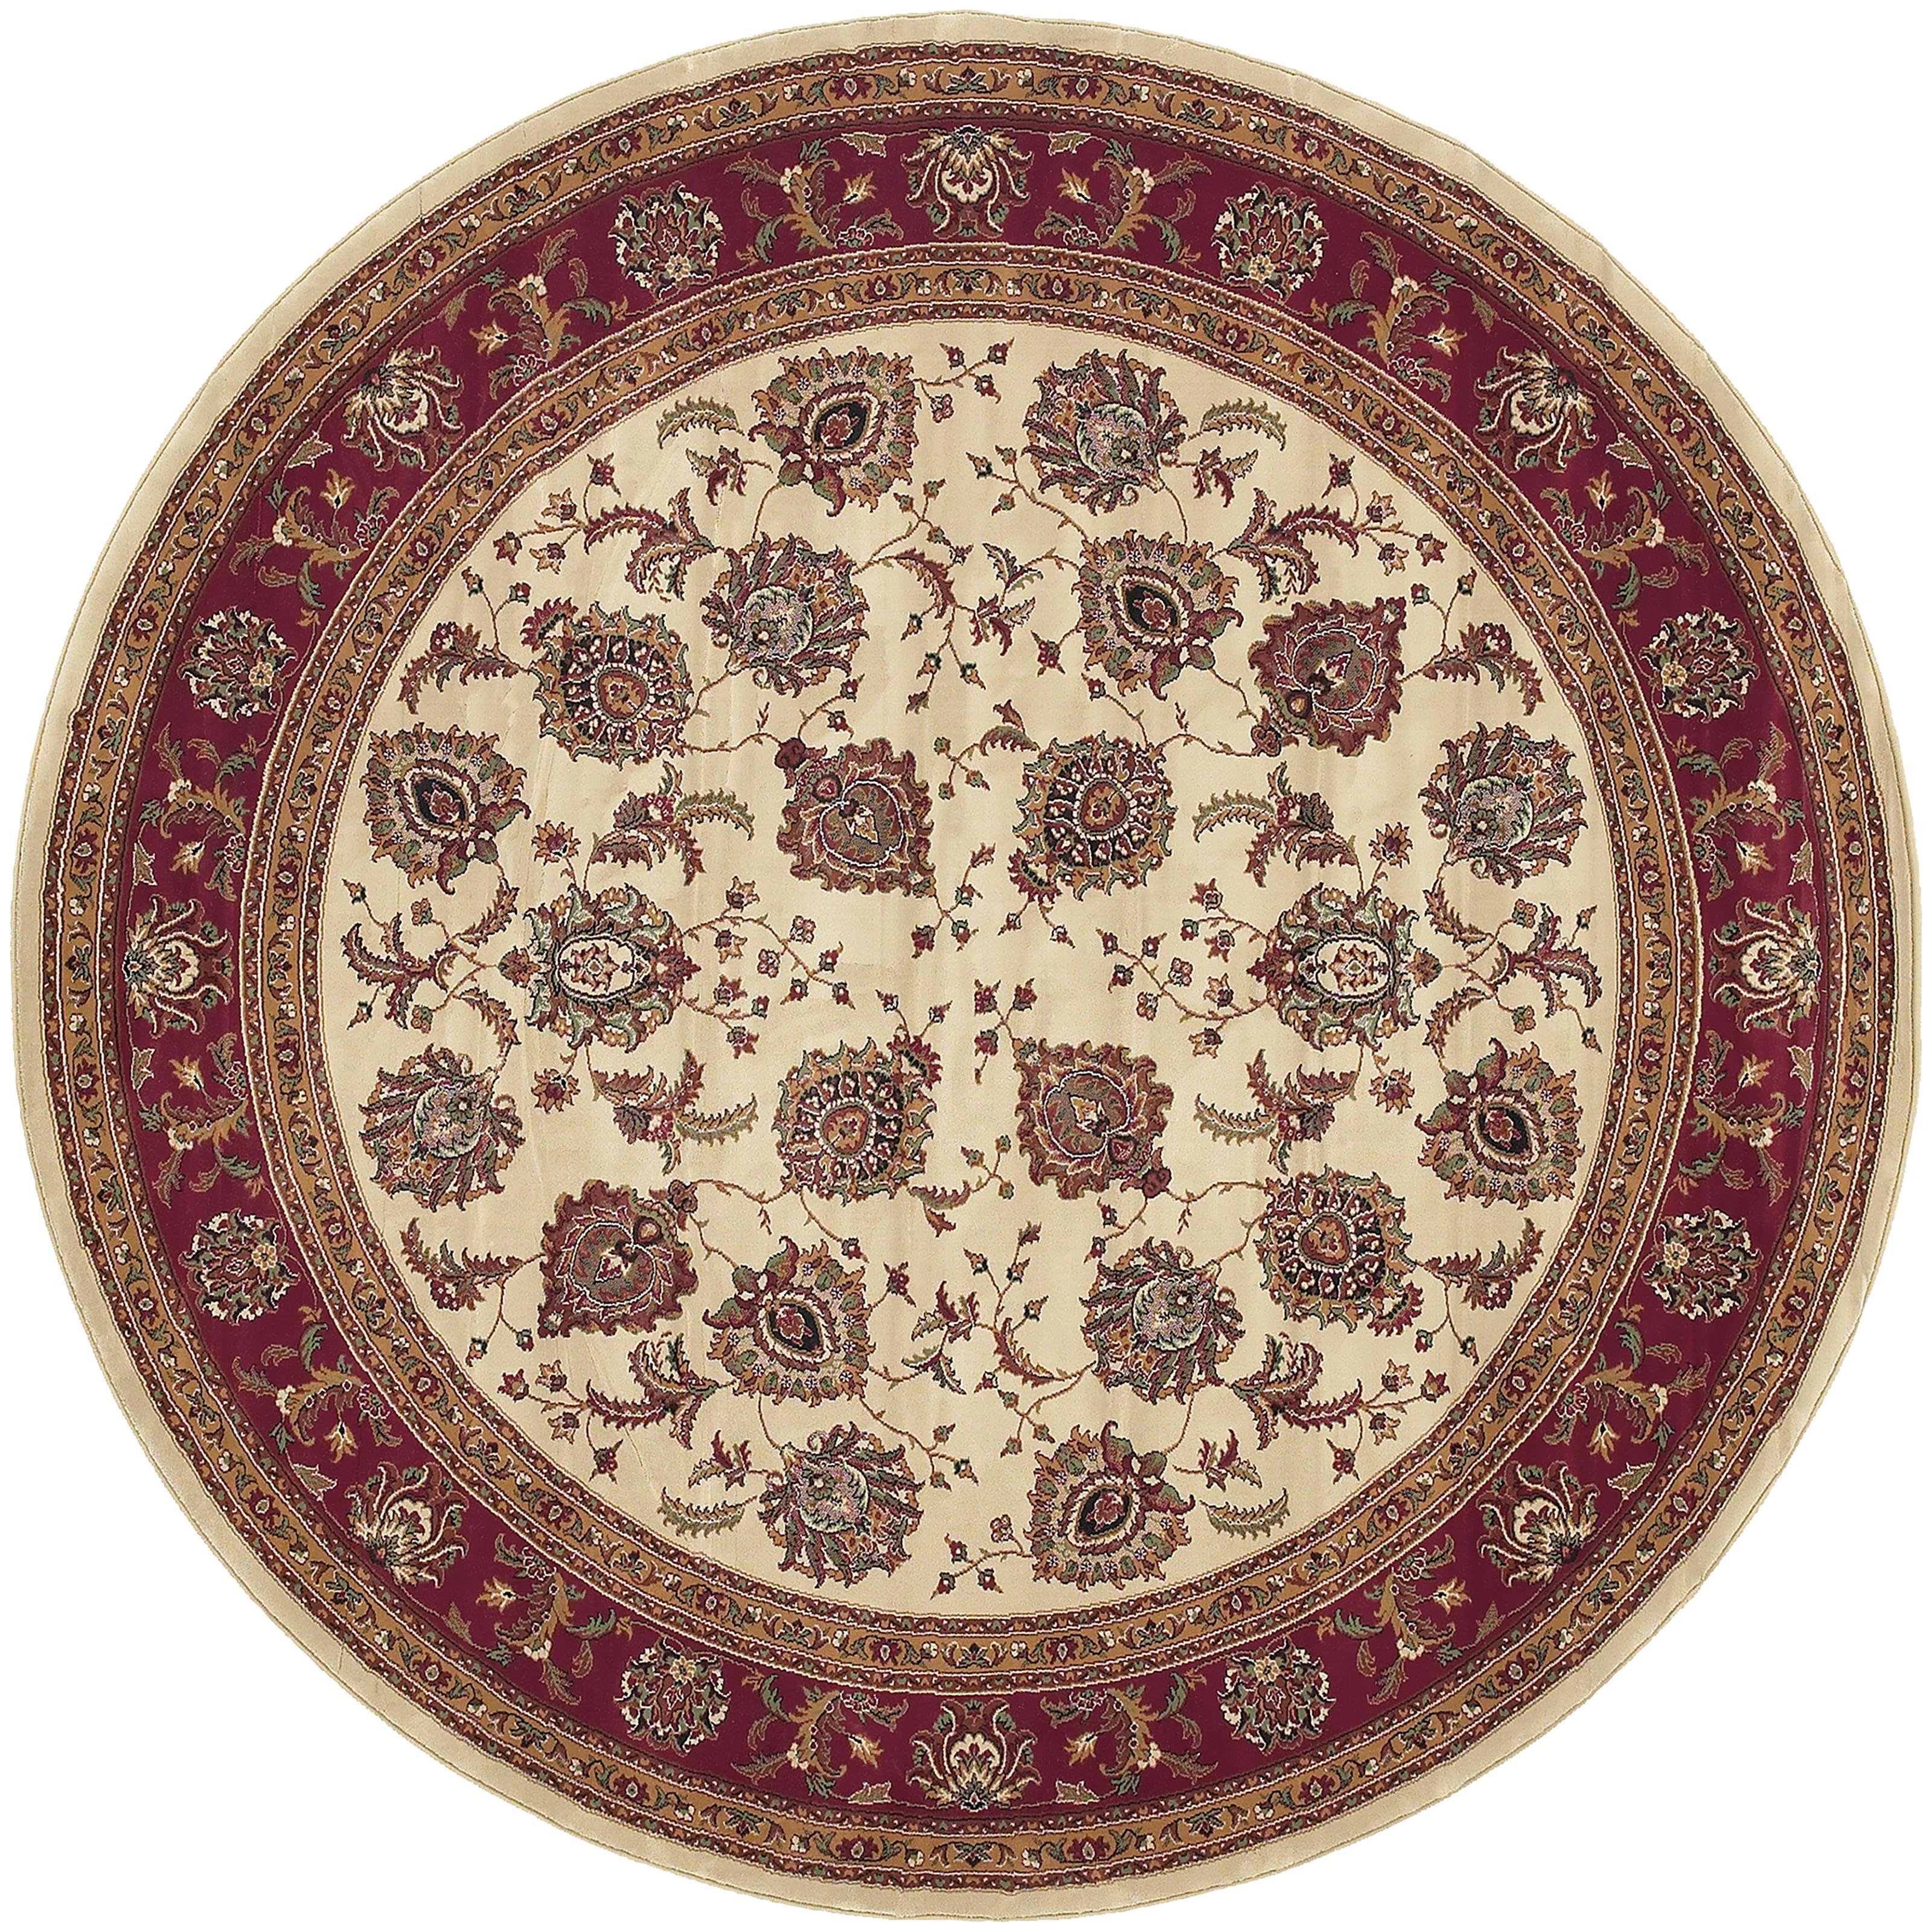 Ariana 8' Rug by Oriental Weavers at Lucas Furniture & Mattress